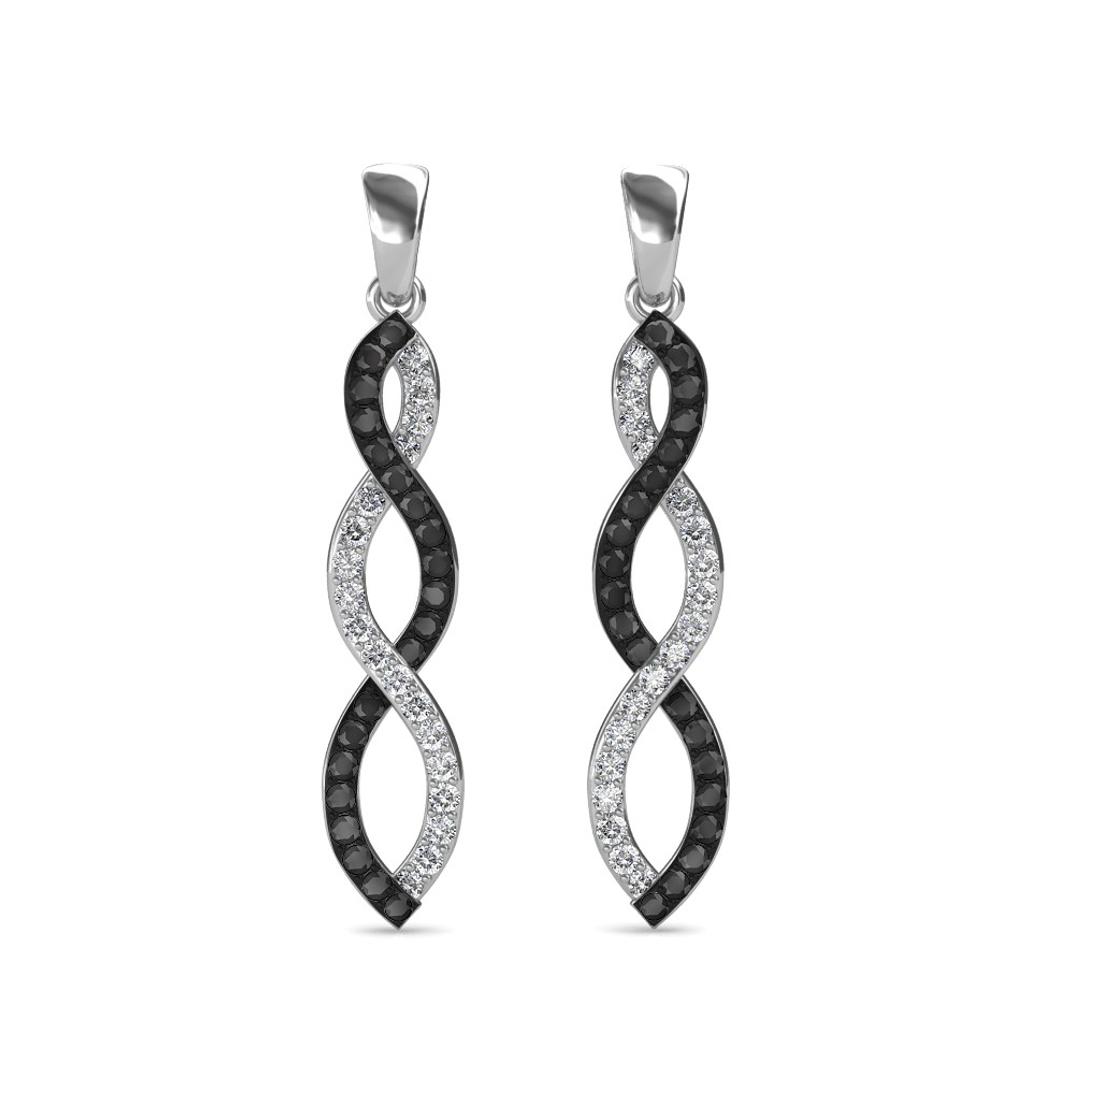 Sarvada Jewels' The Ezra Black Diamond Long Earrings